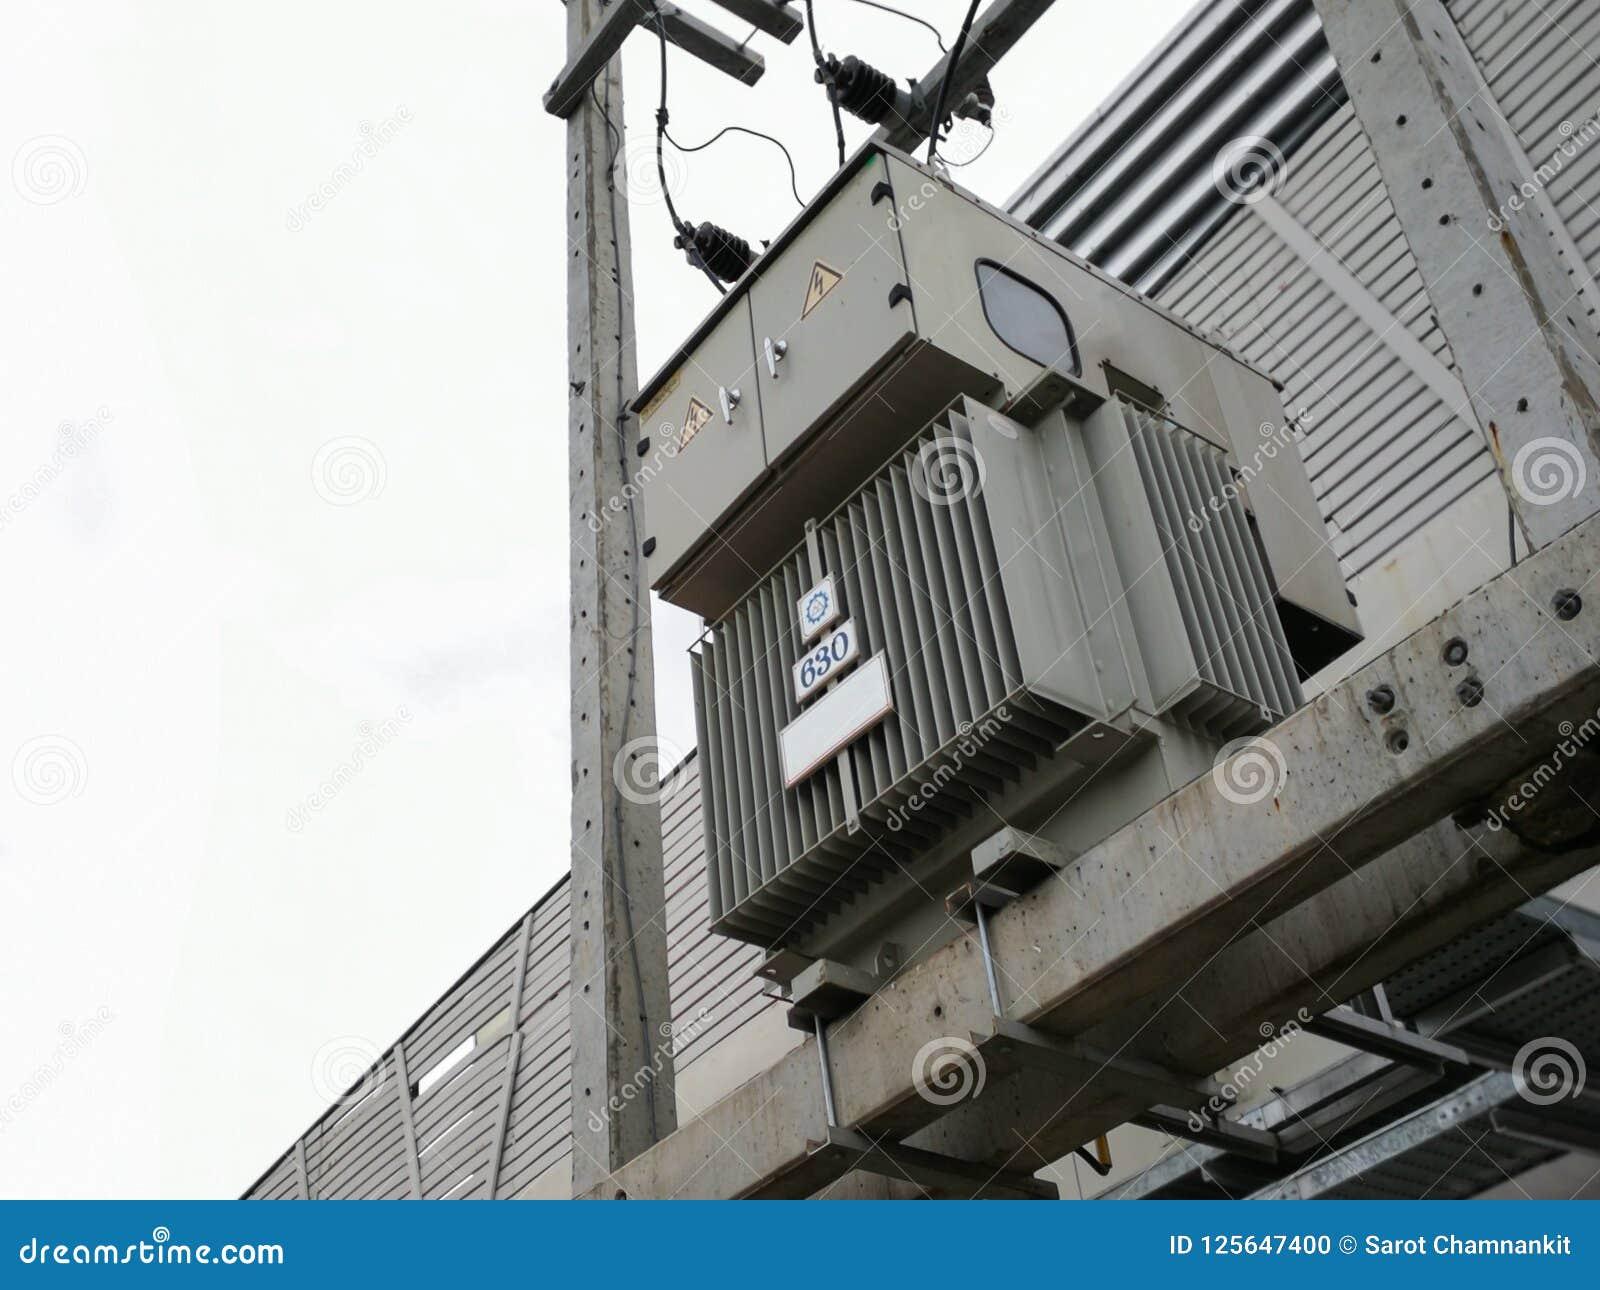 Three phase 630 kVA electric current transformer.